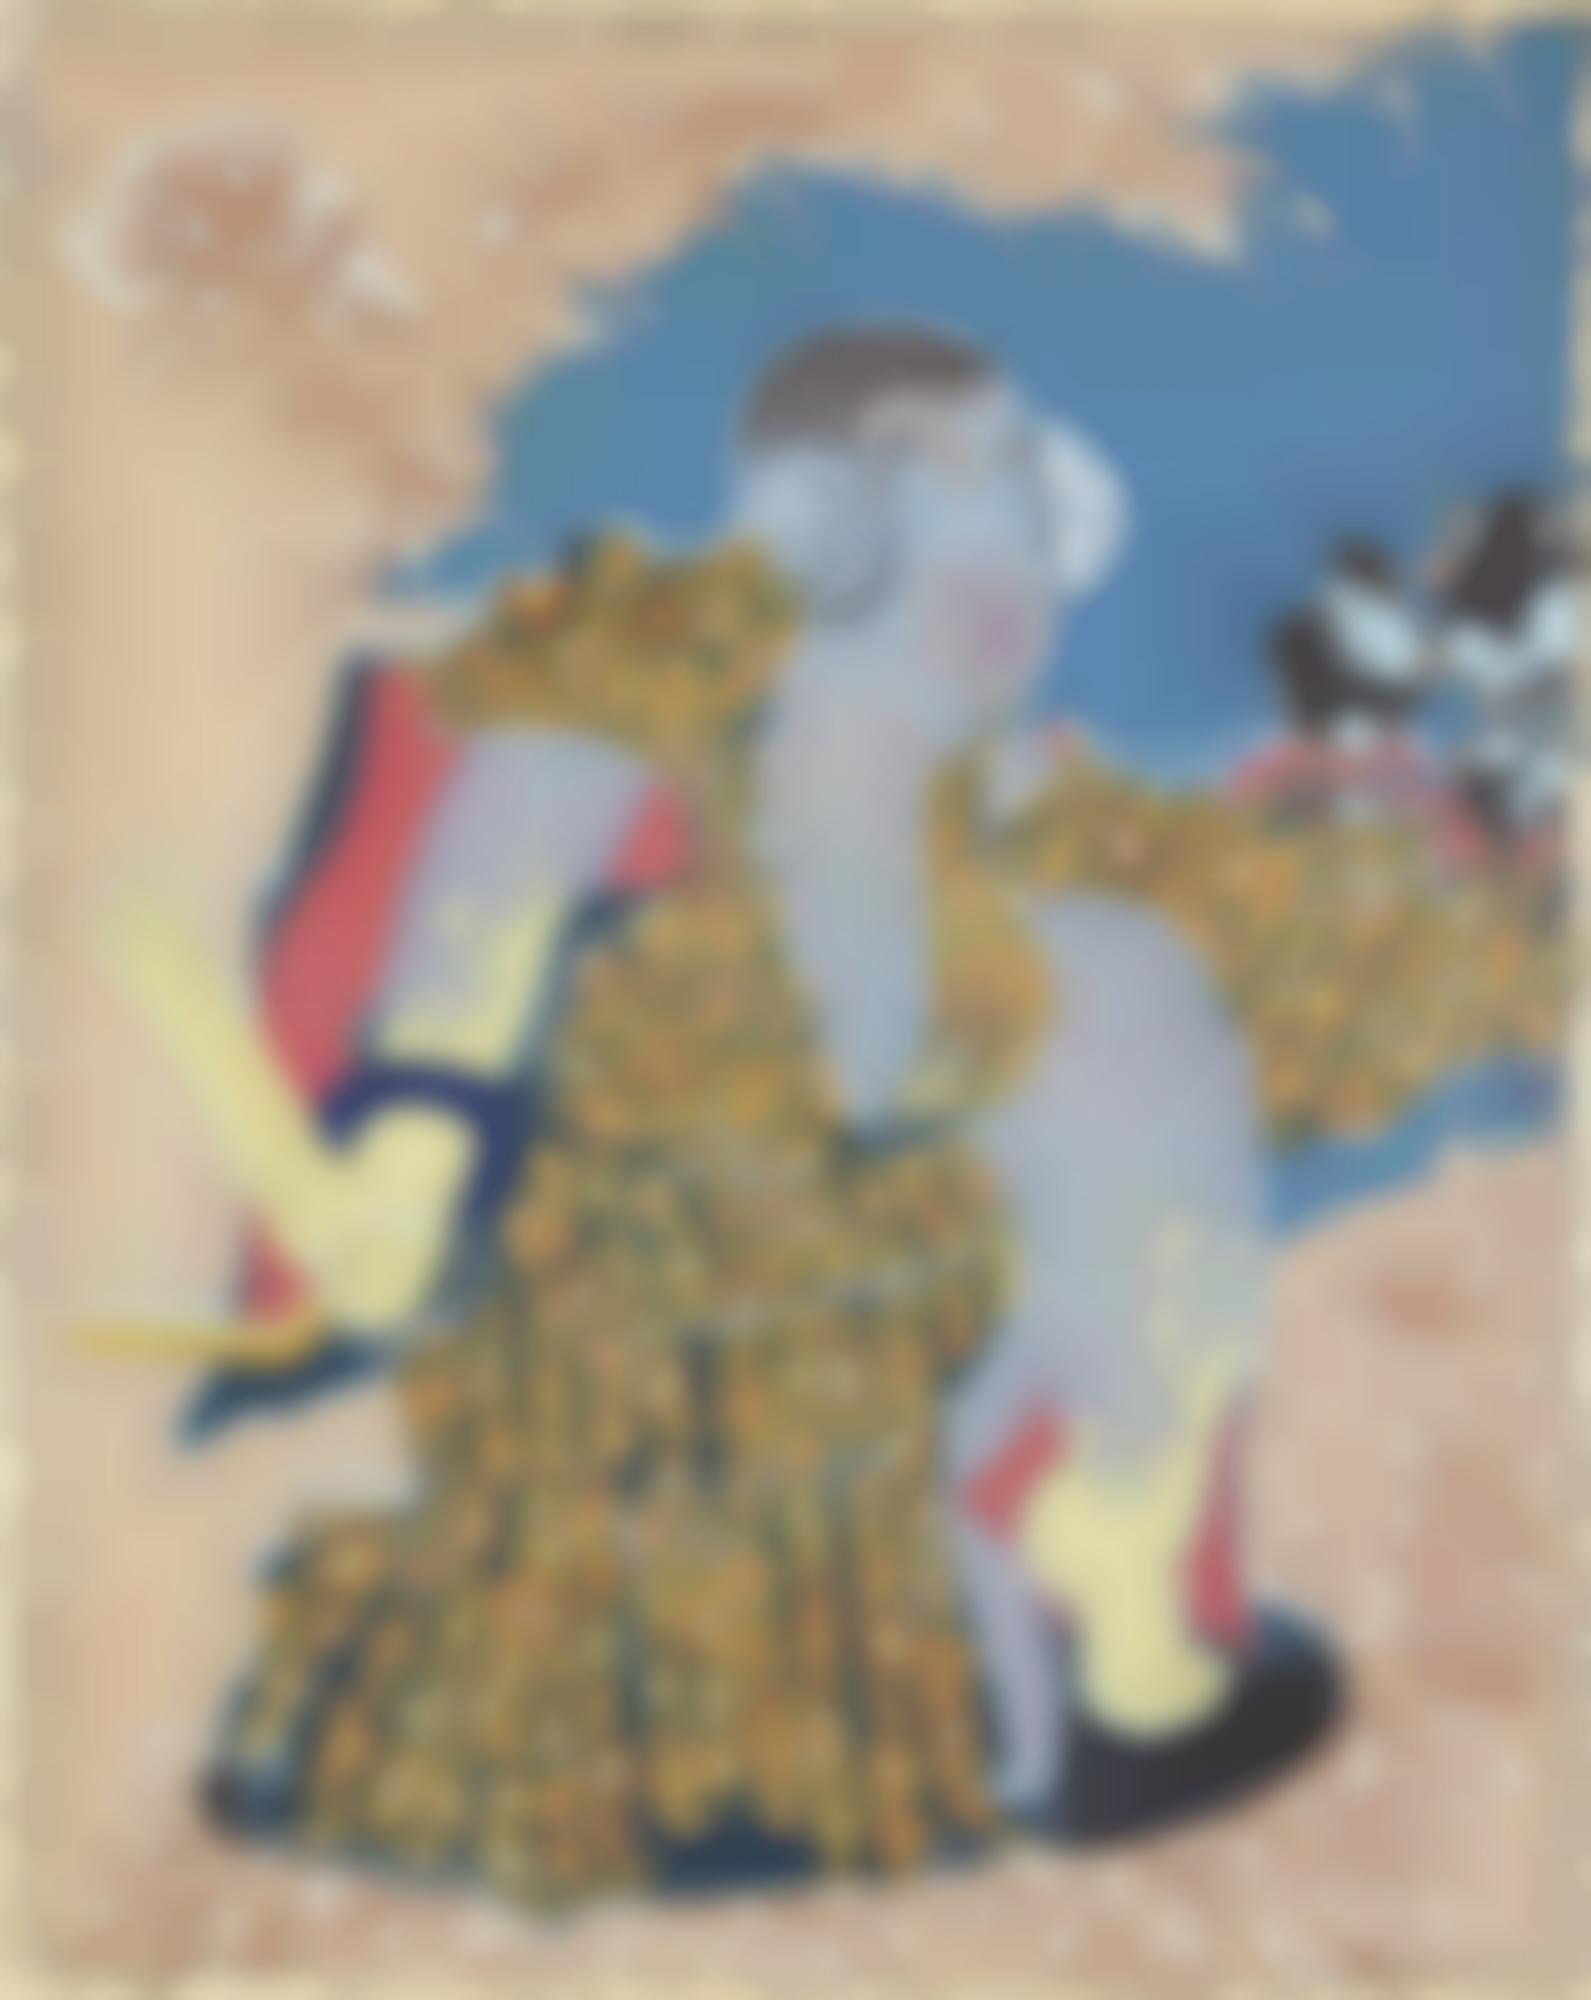 Iona Rozeal Brown-Whoshi: The Sender (After Yoshitoshi'S 'The Ghost Of Taira No Tomomori Appears At Diamotsu Bay')-2008